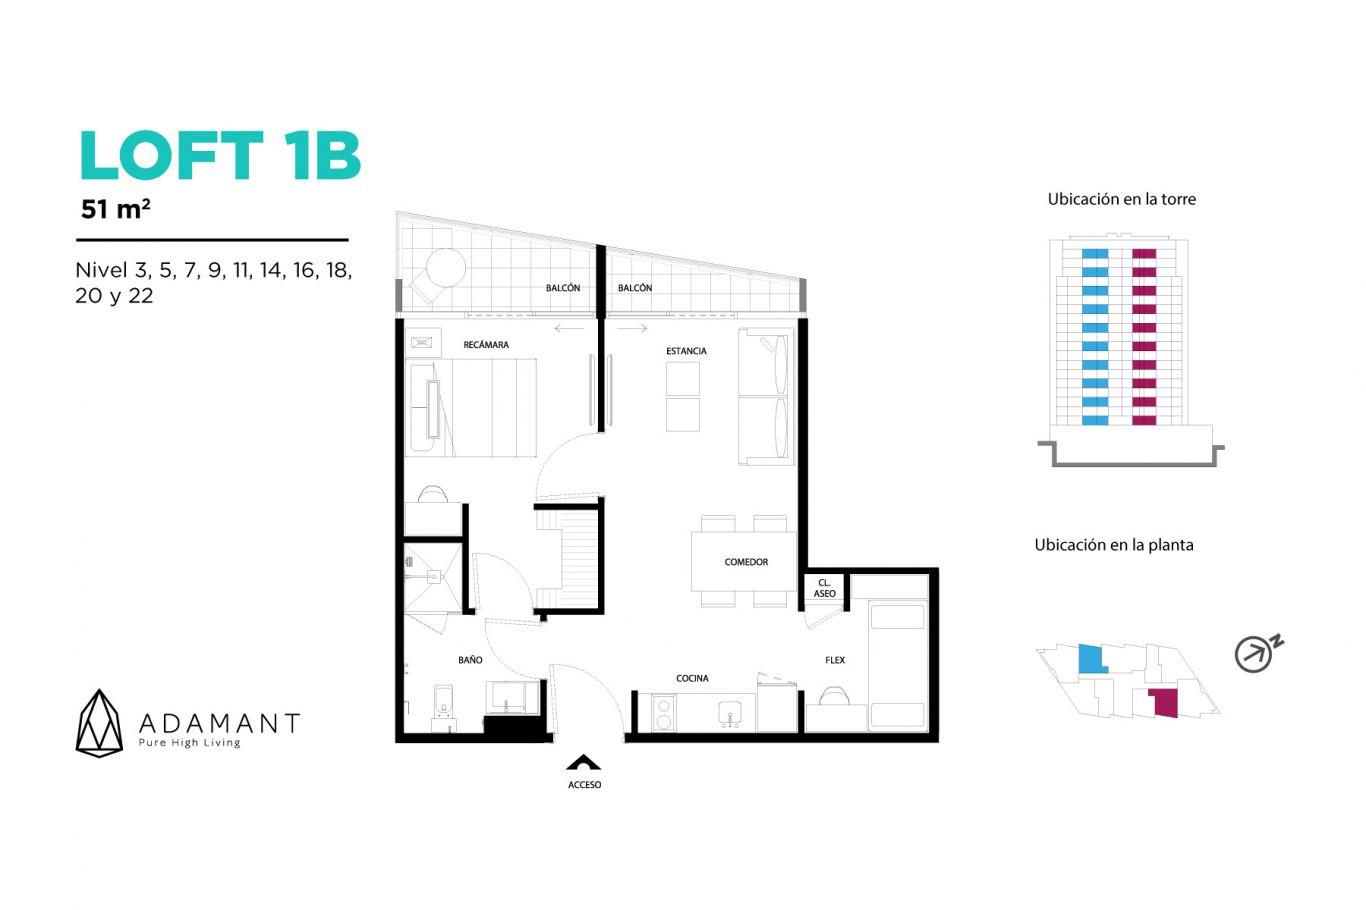 Adamant tijuana, id 1656034, no 1, plano de loft 1b, 518